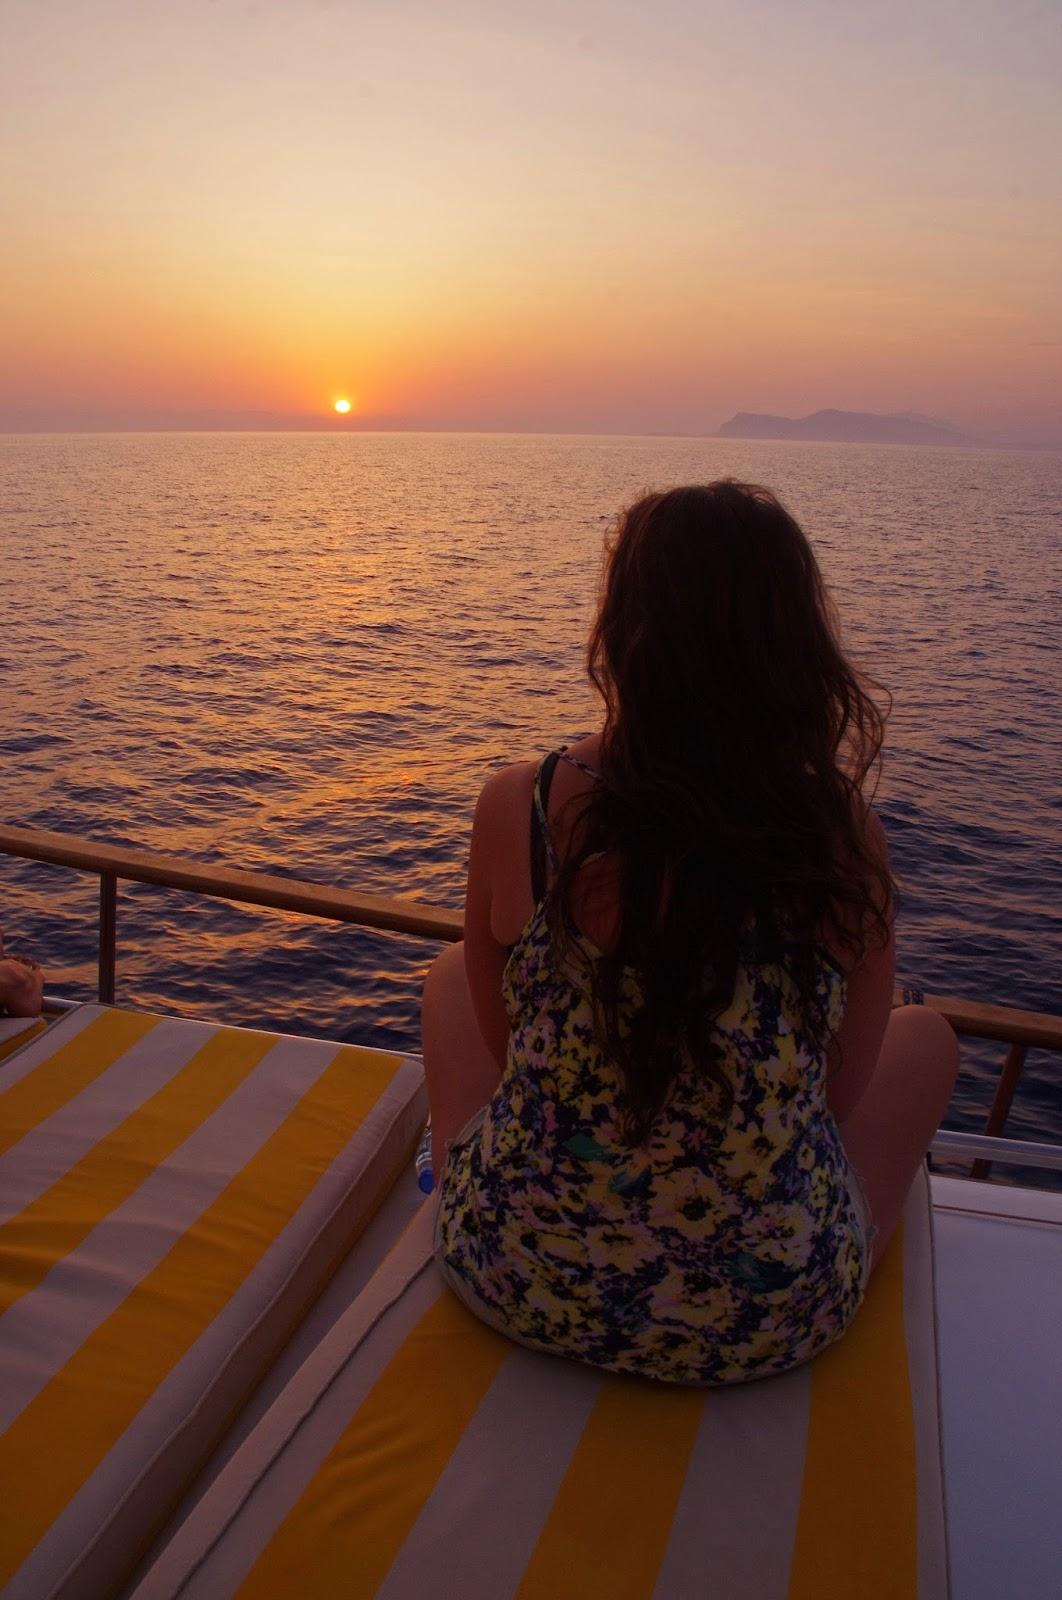 Girl watching sunset sailing in Turkey